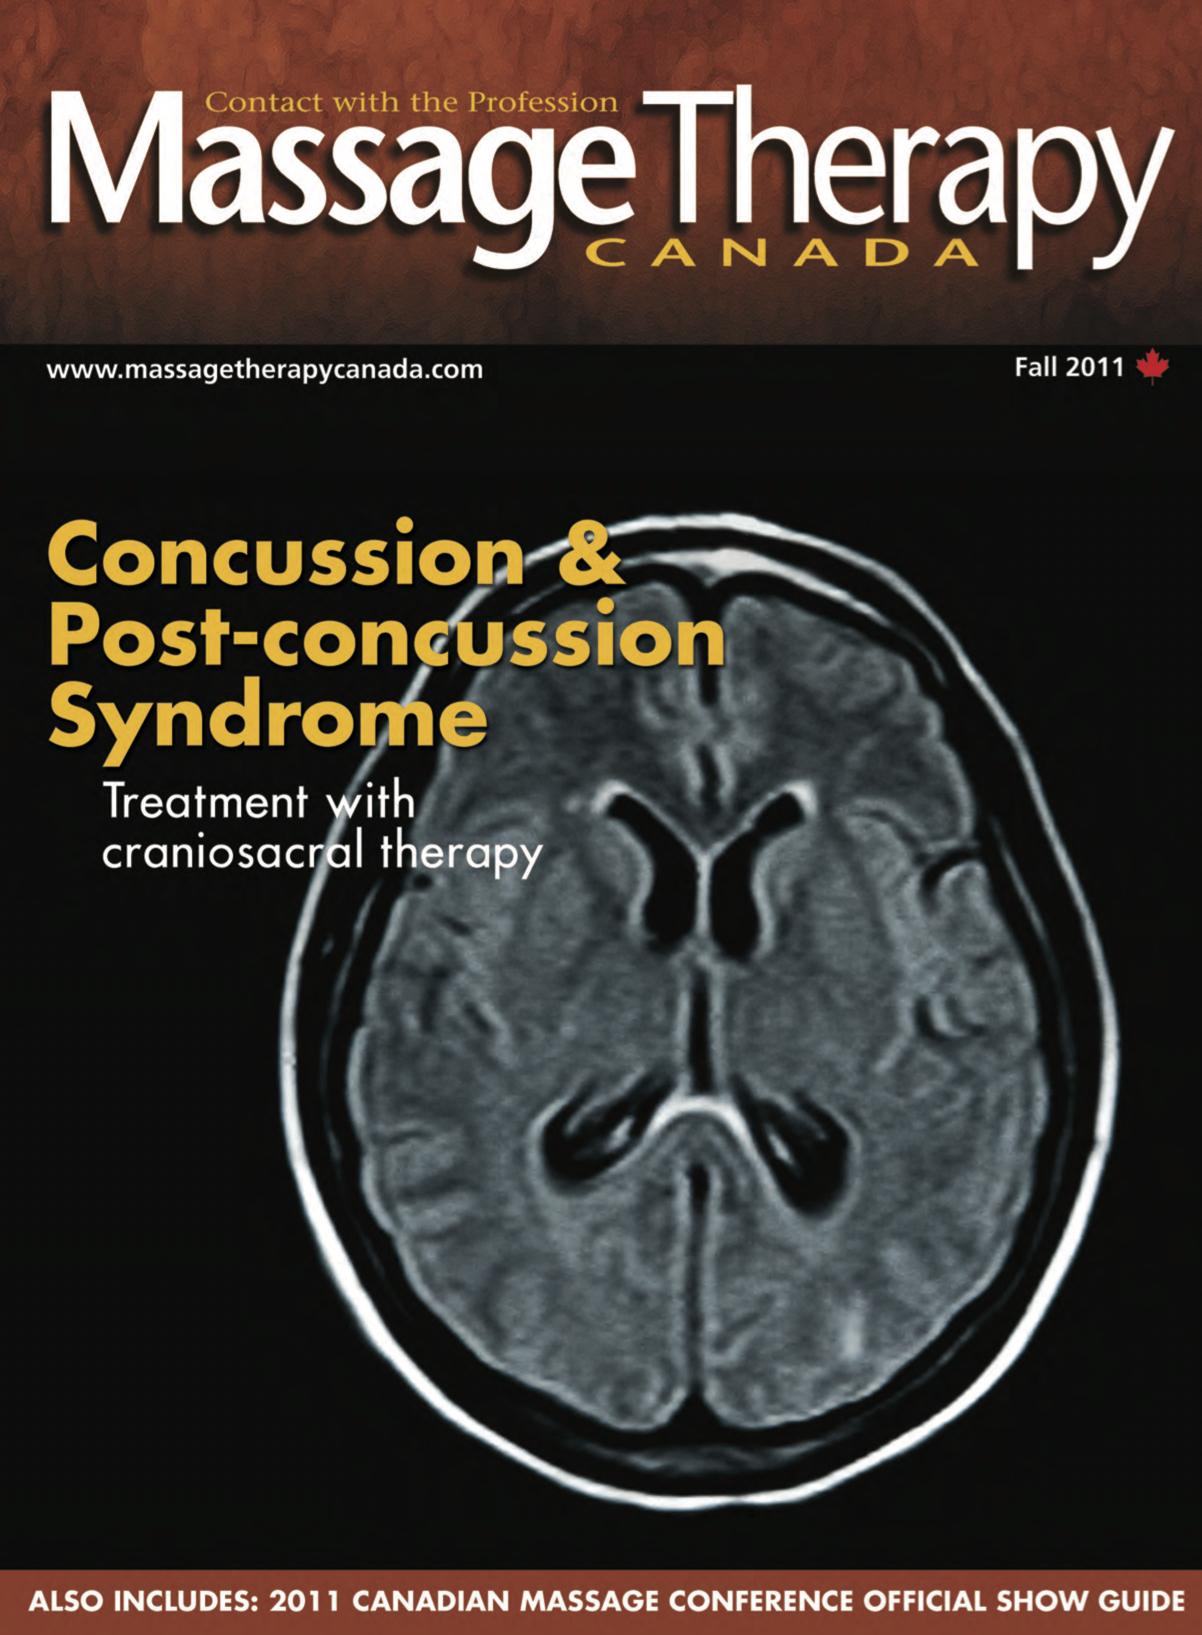 Massage Therapy Canada - Fall 2011